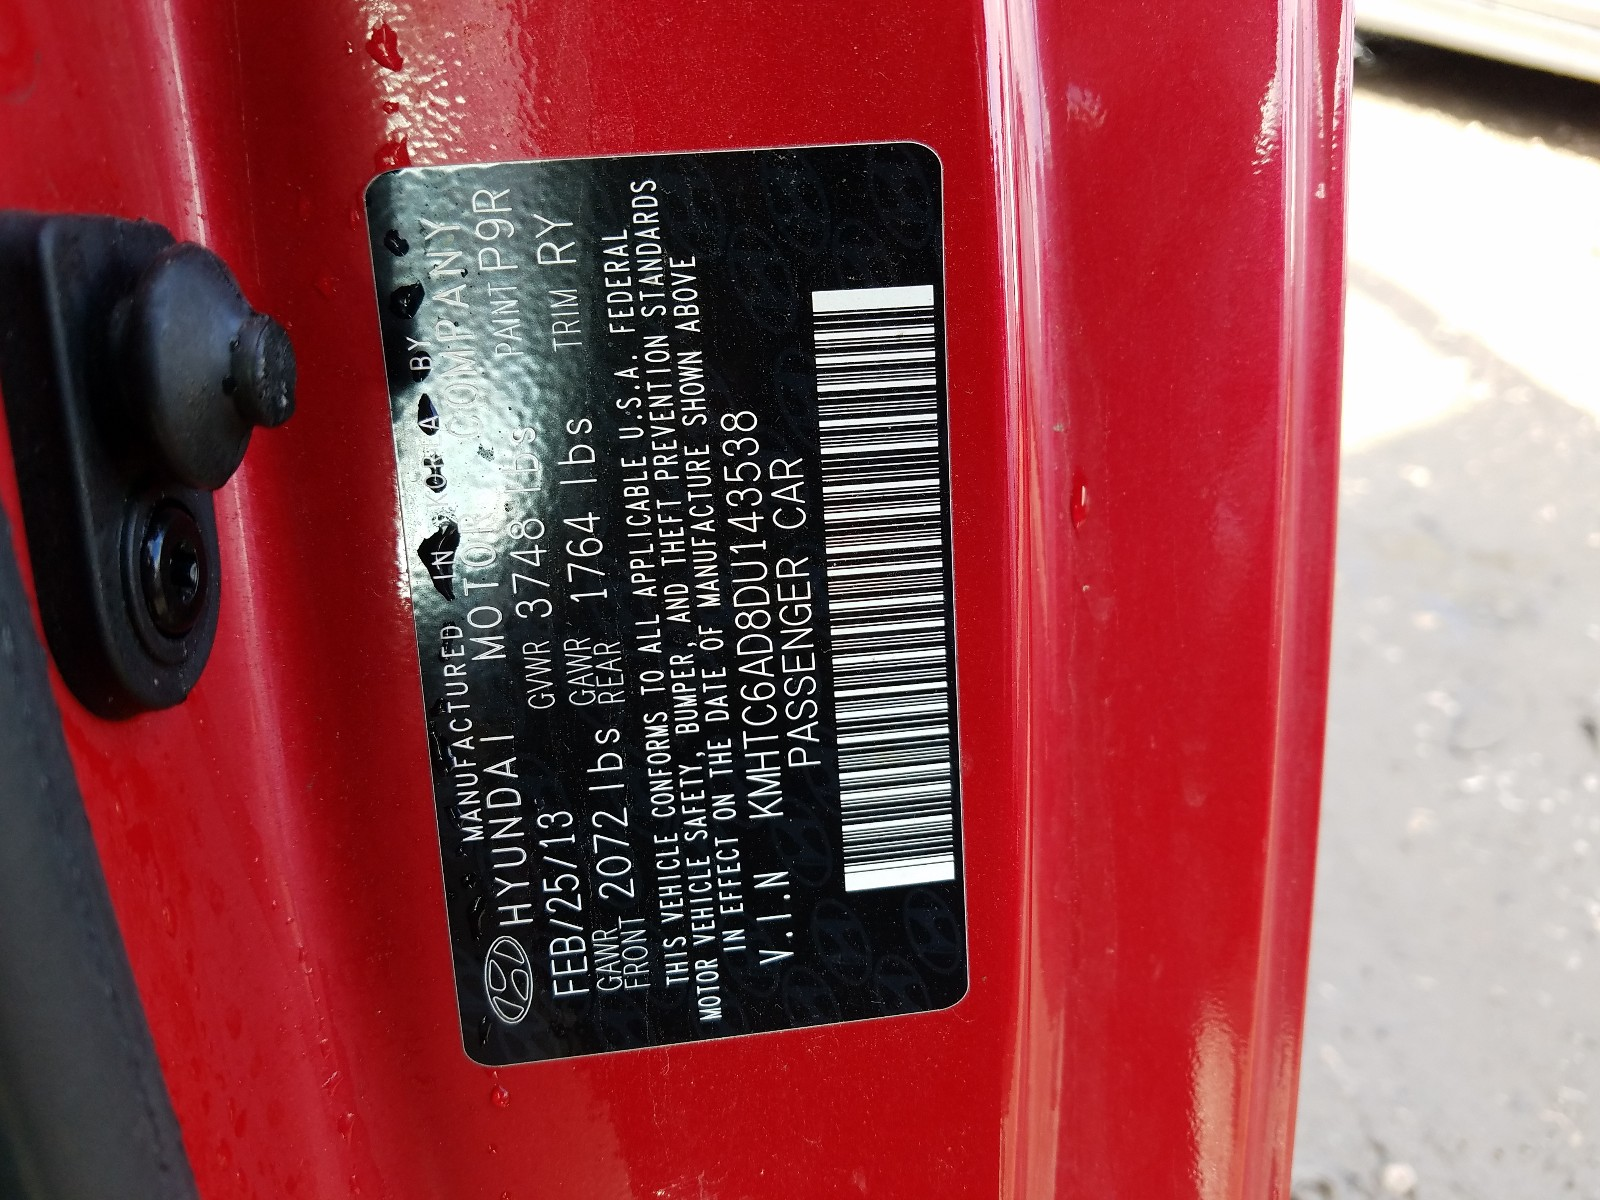 KMHTC6AD8DU143538 - 2013 Hyundai Veloster 1.6L